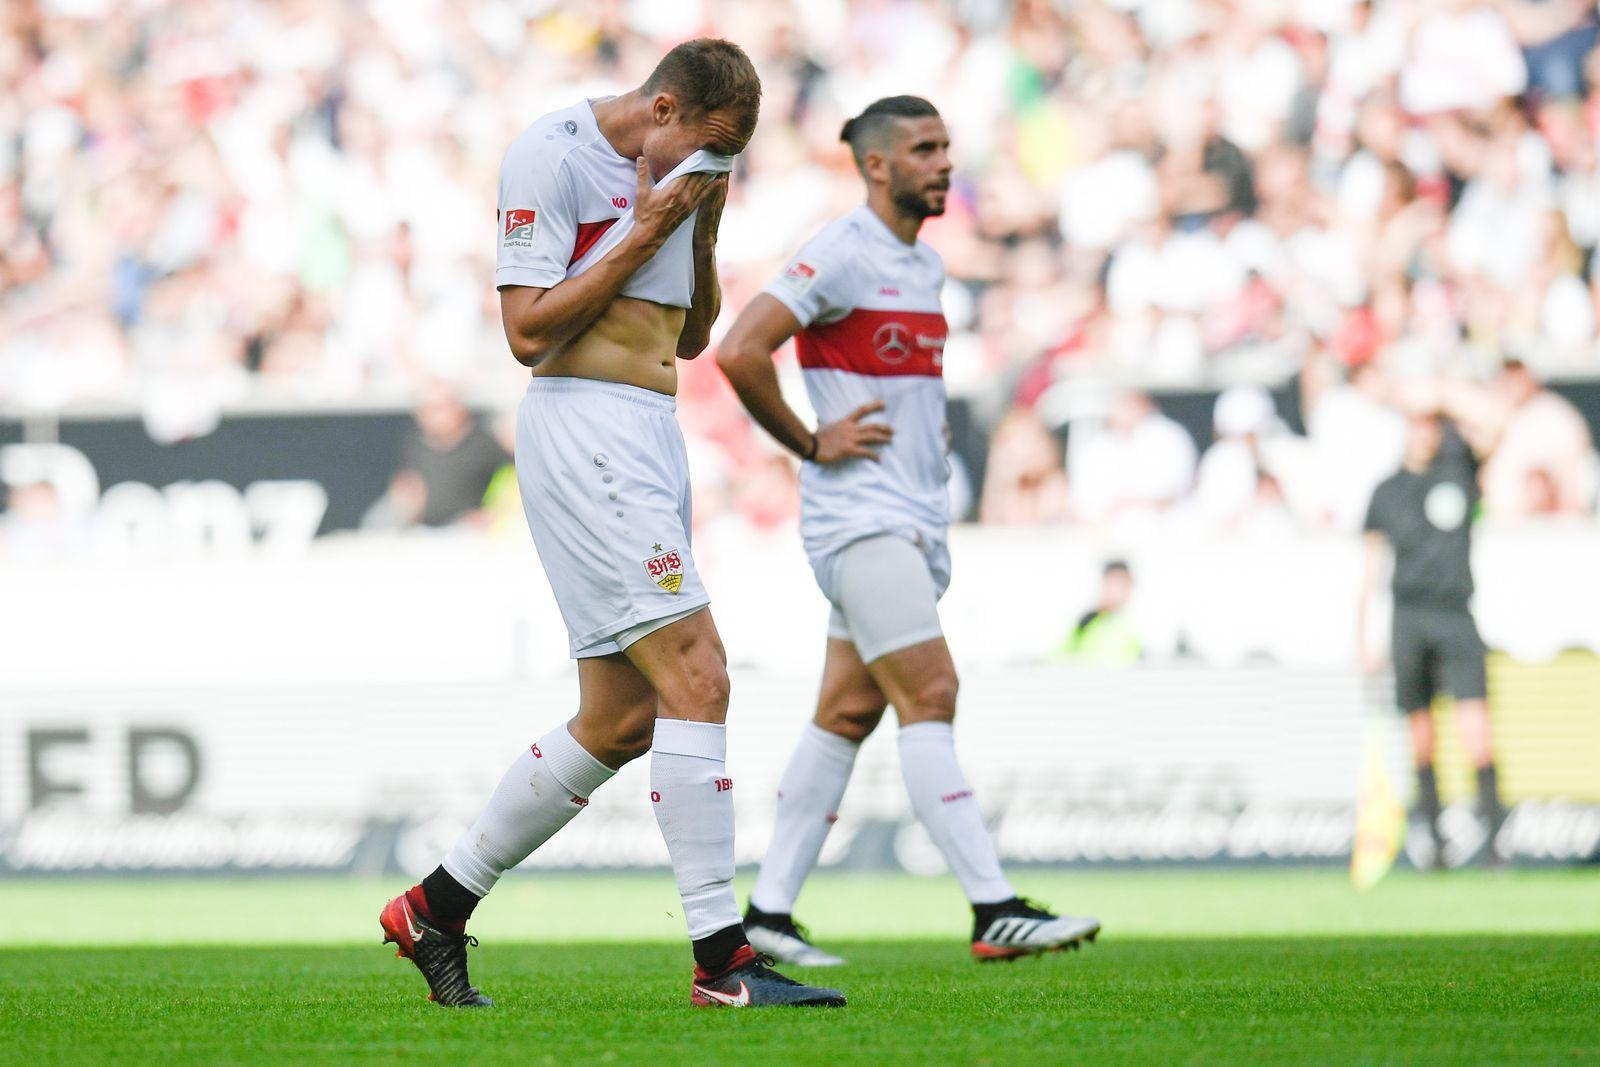 VfB Stuttgart - Holstein Kiel